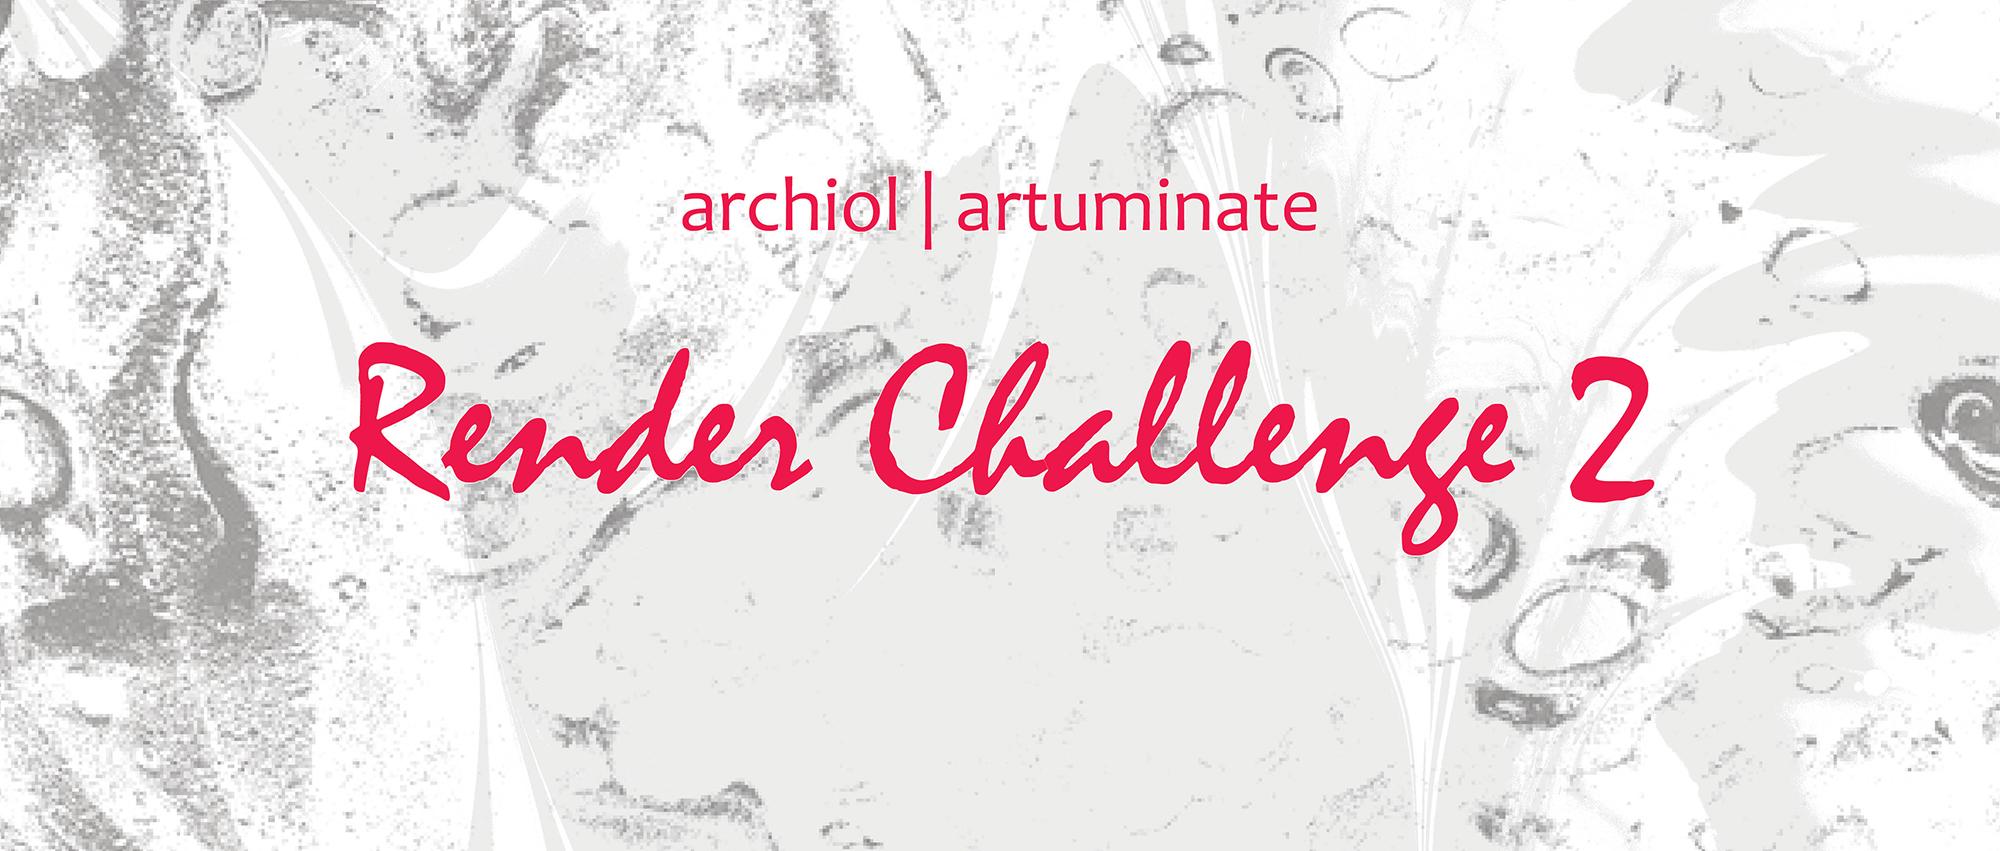 archiol   artuminate 第二届建筑渲染大赛